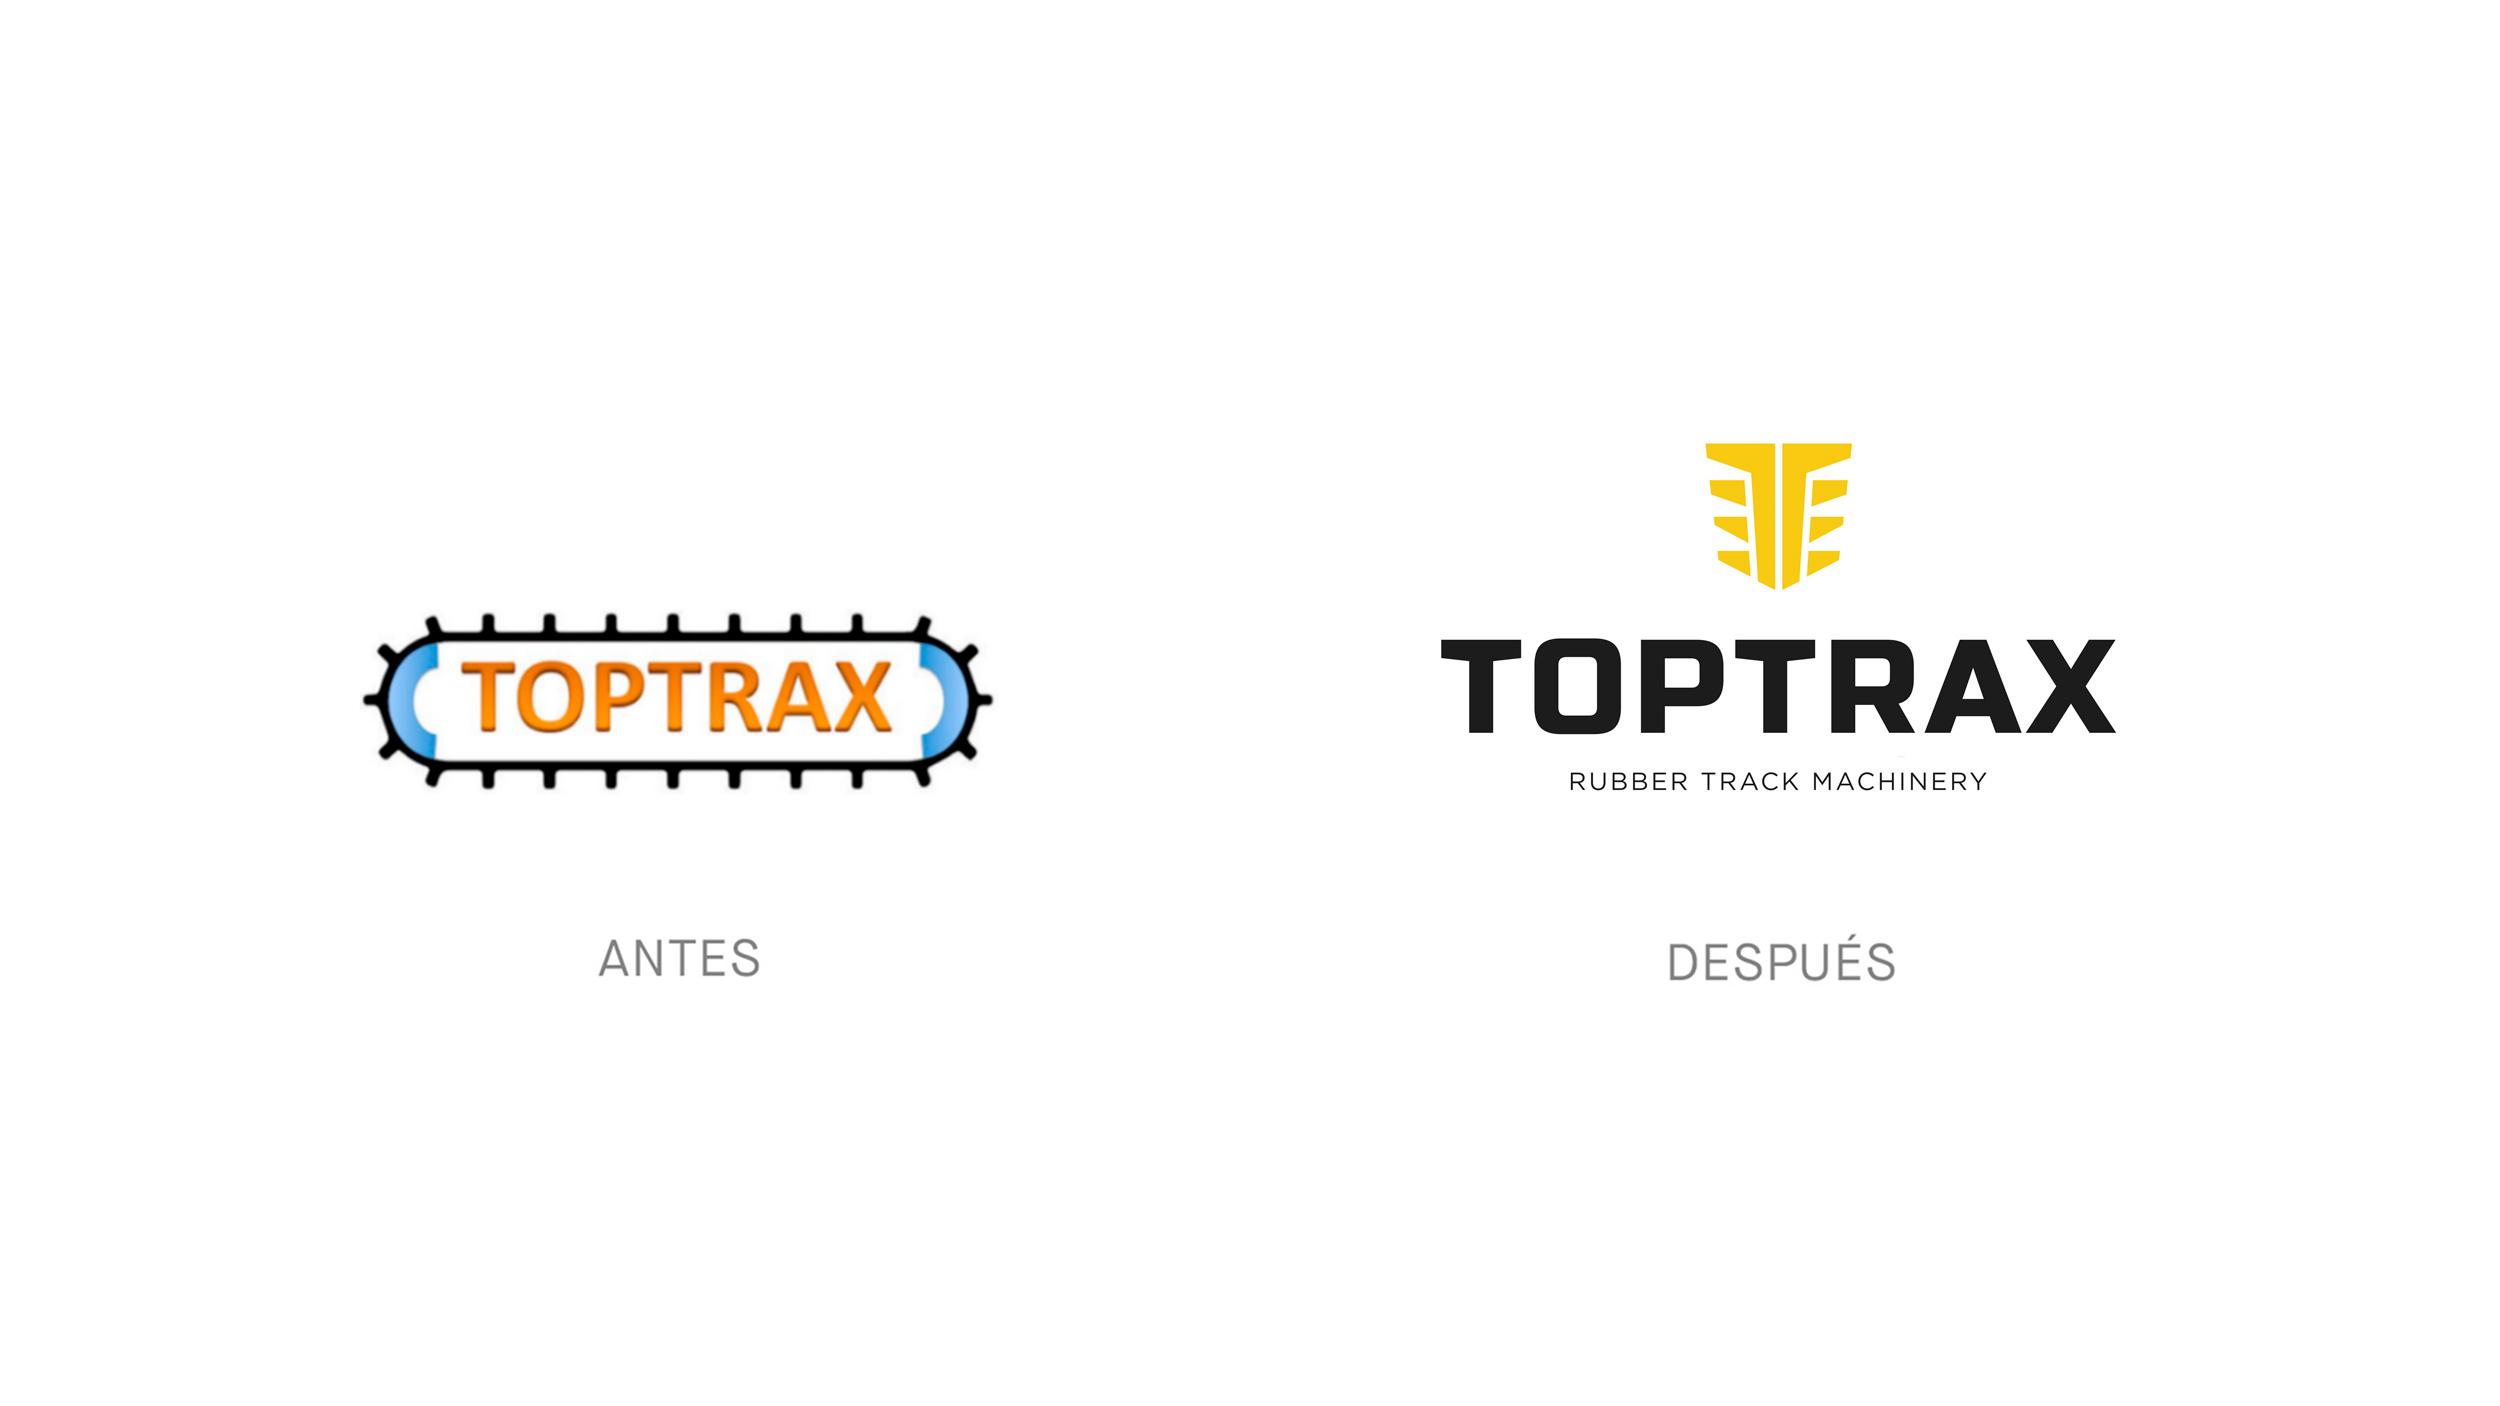 kamikaze-identidad-corporativa-toptrax-diseno-grafico-22